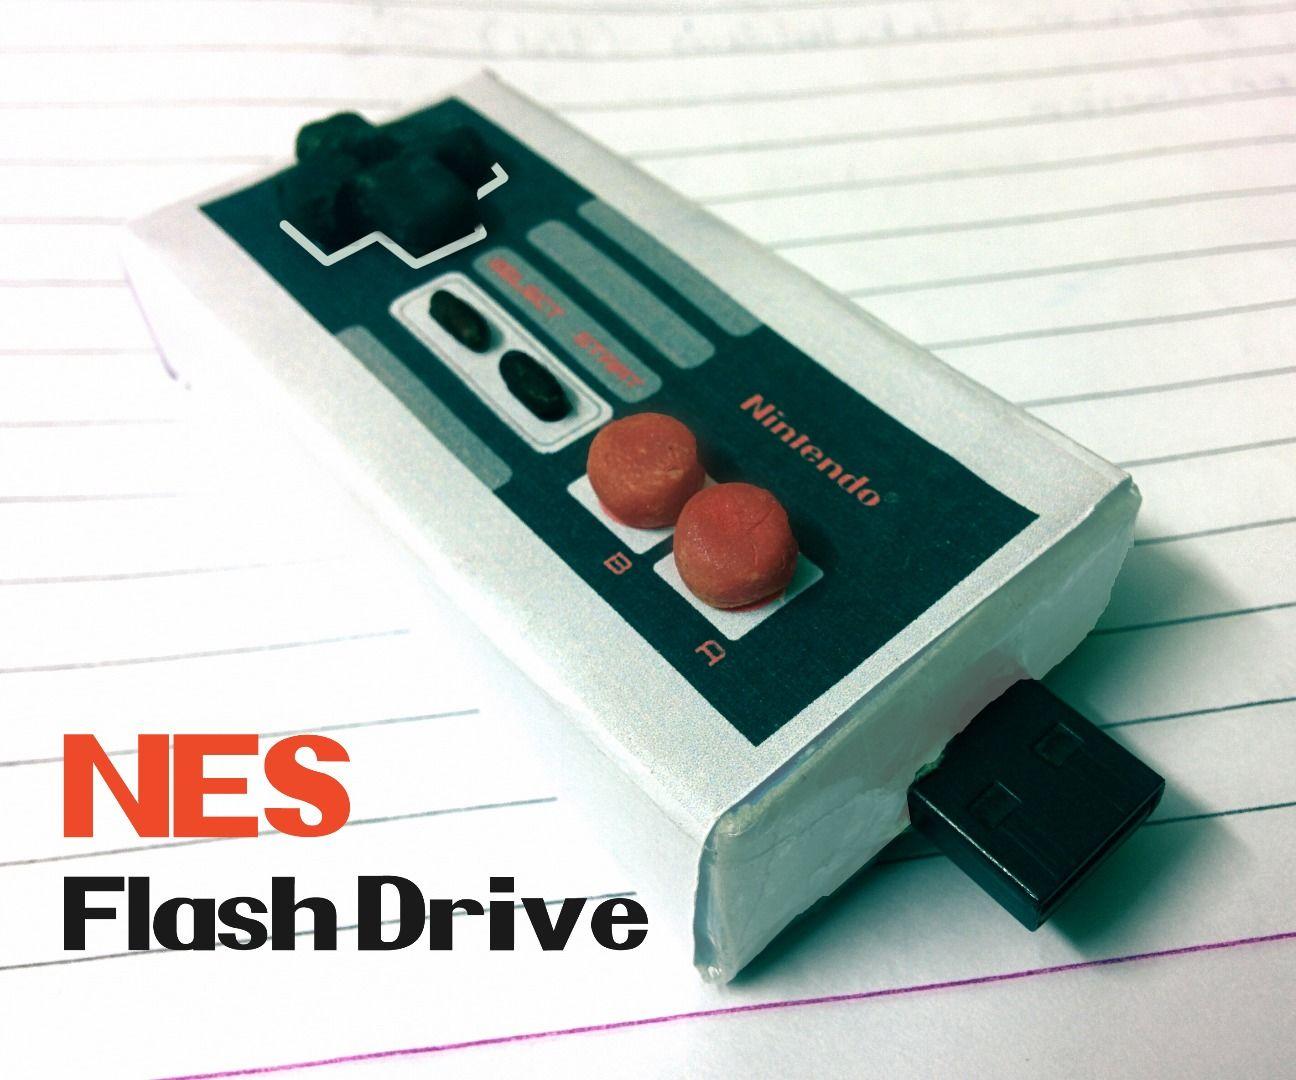 The NES Flash Drive